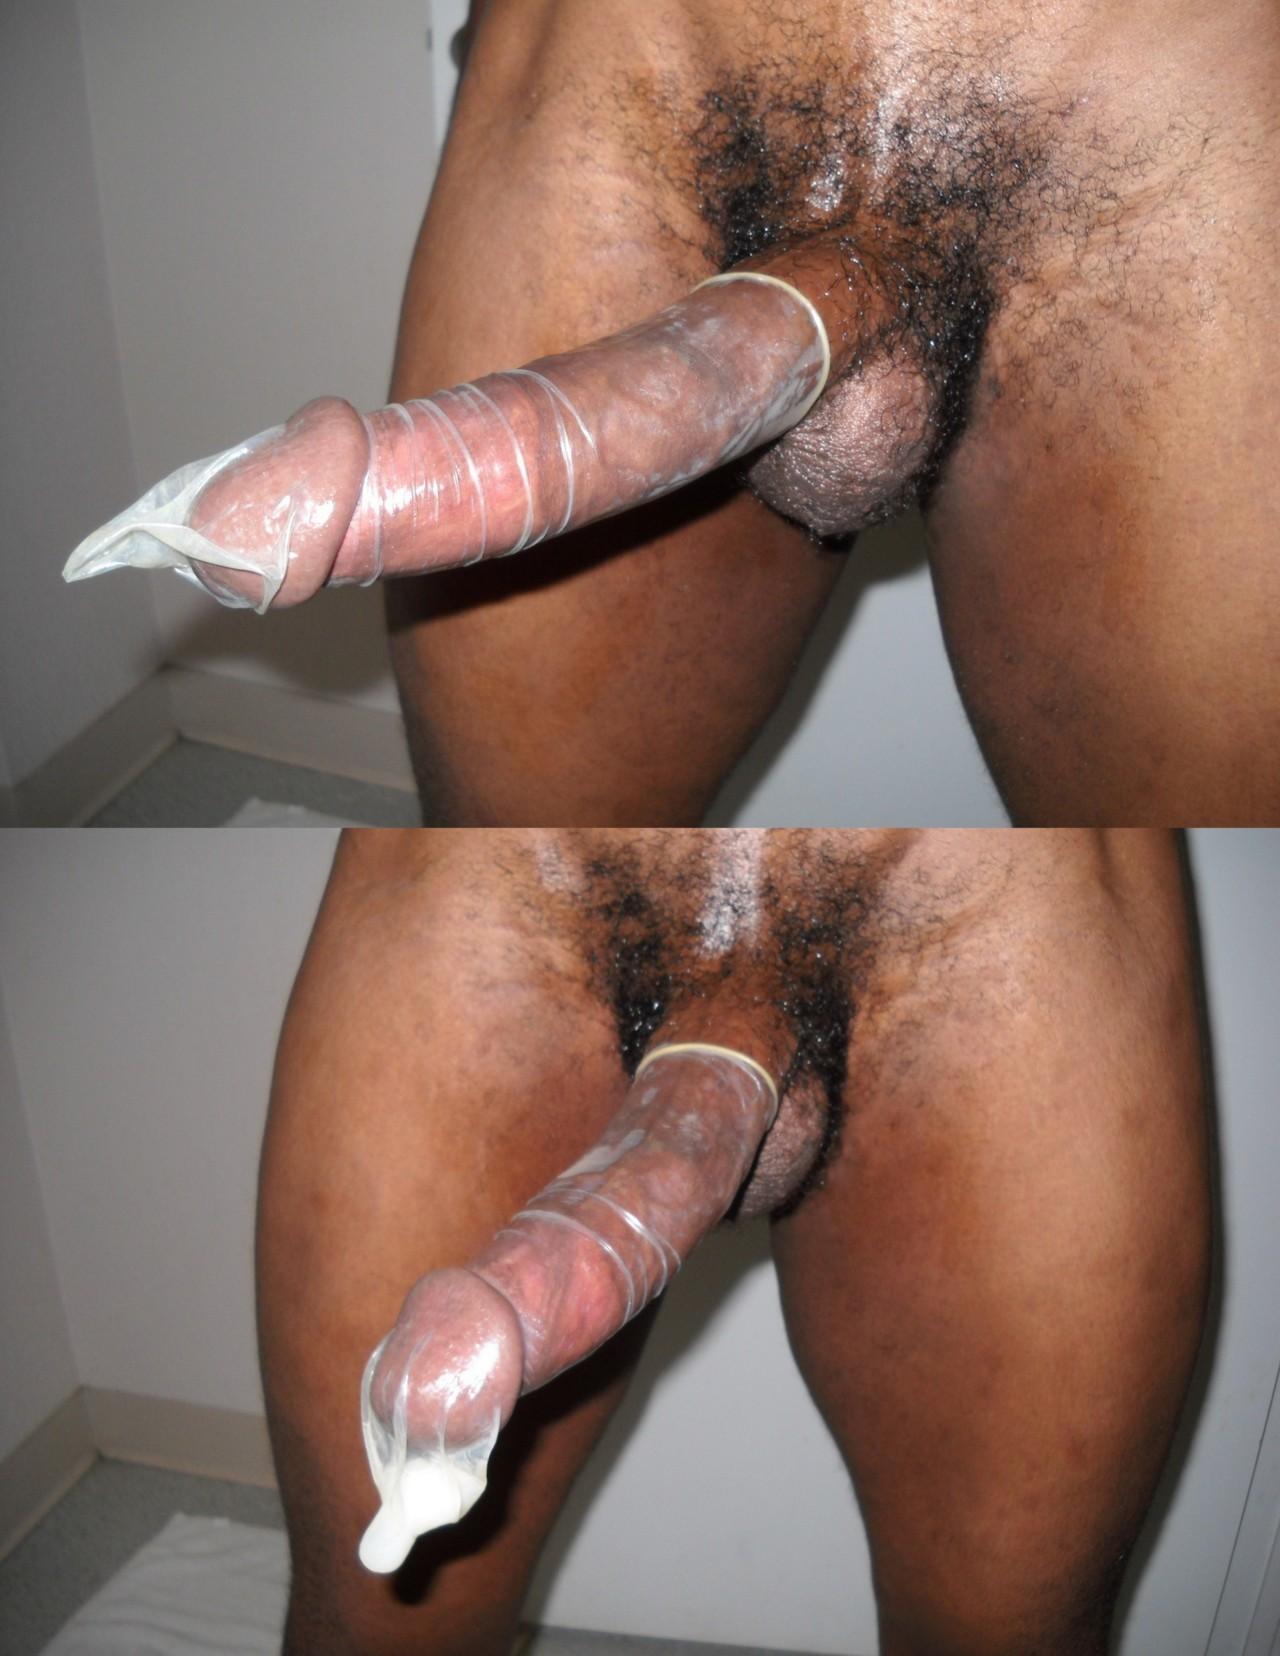 Skinny nude brunette girl masturbating